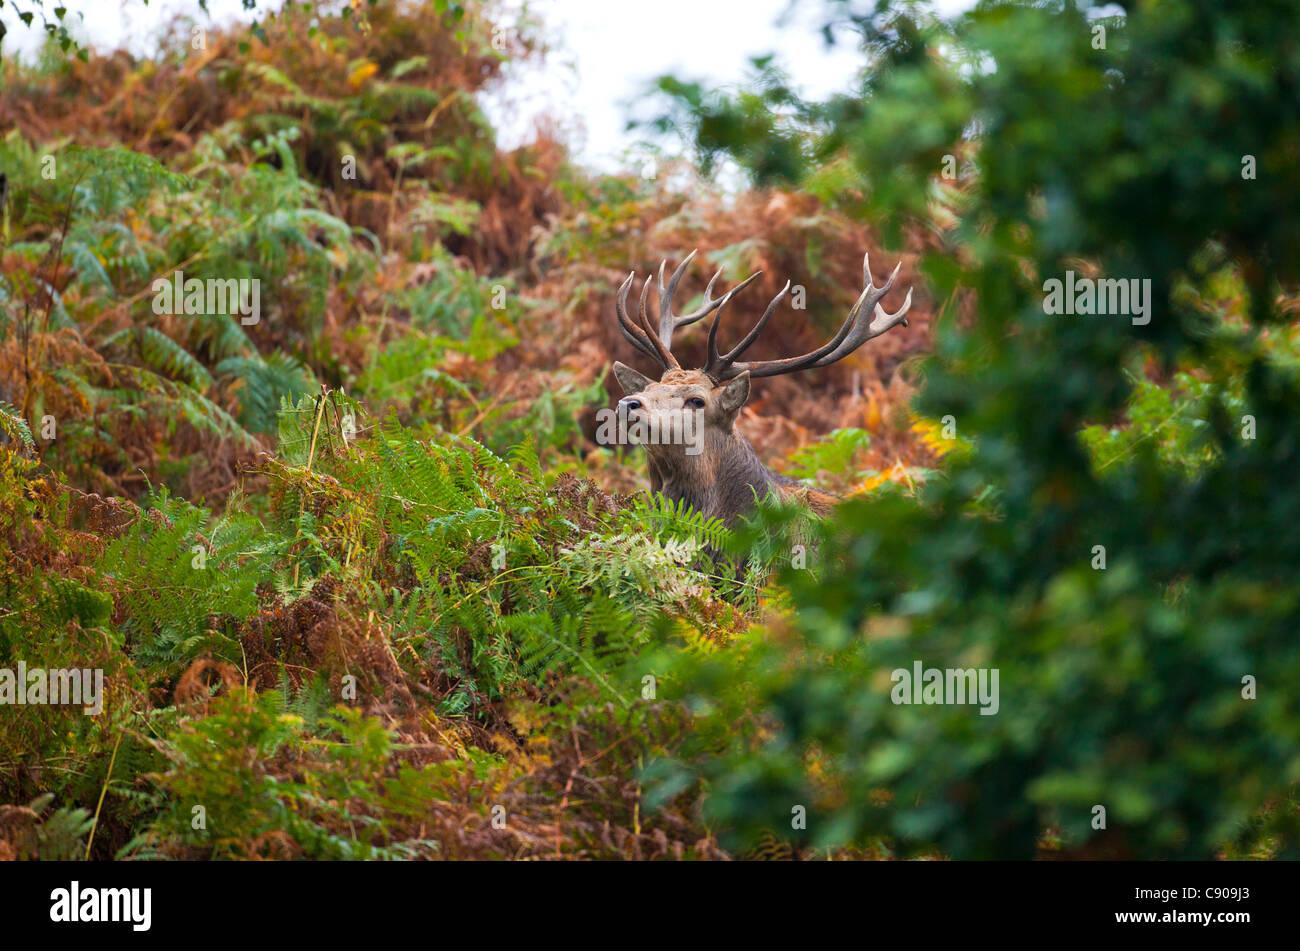 Red deer (Cervus elaphus) - Stock Image